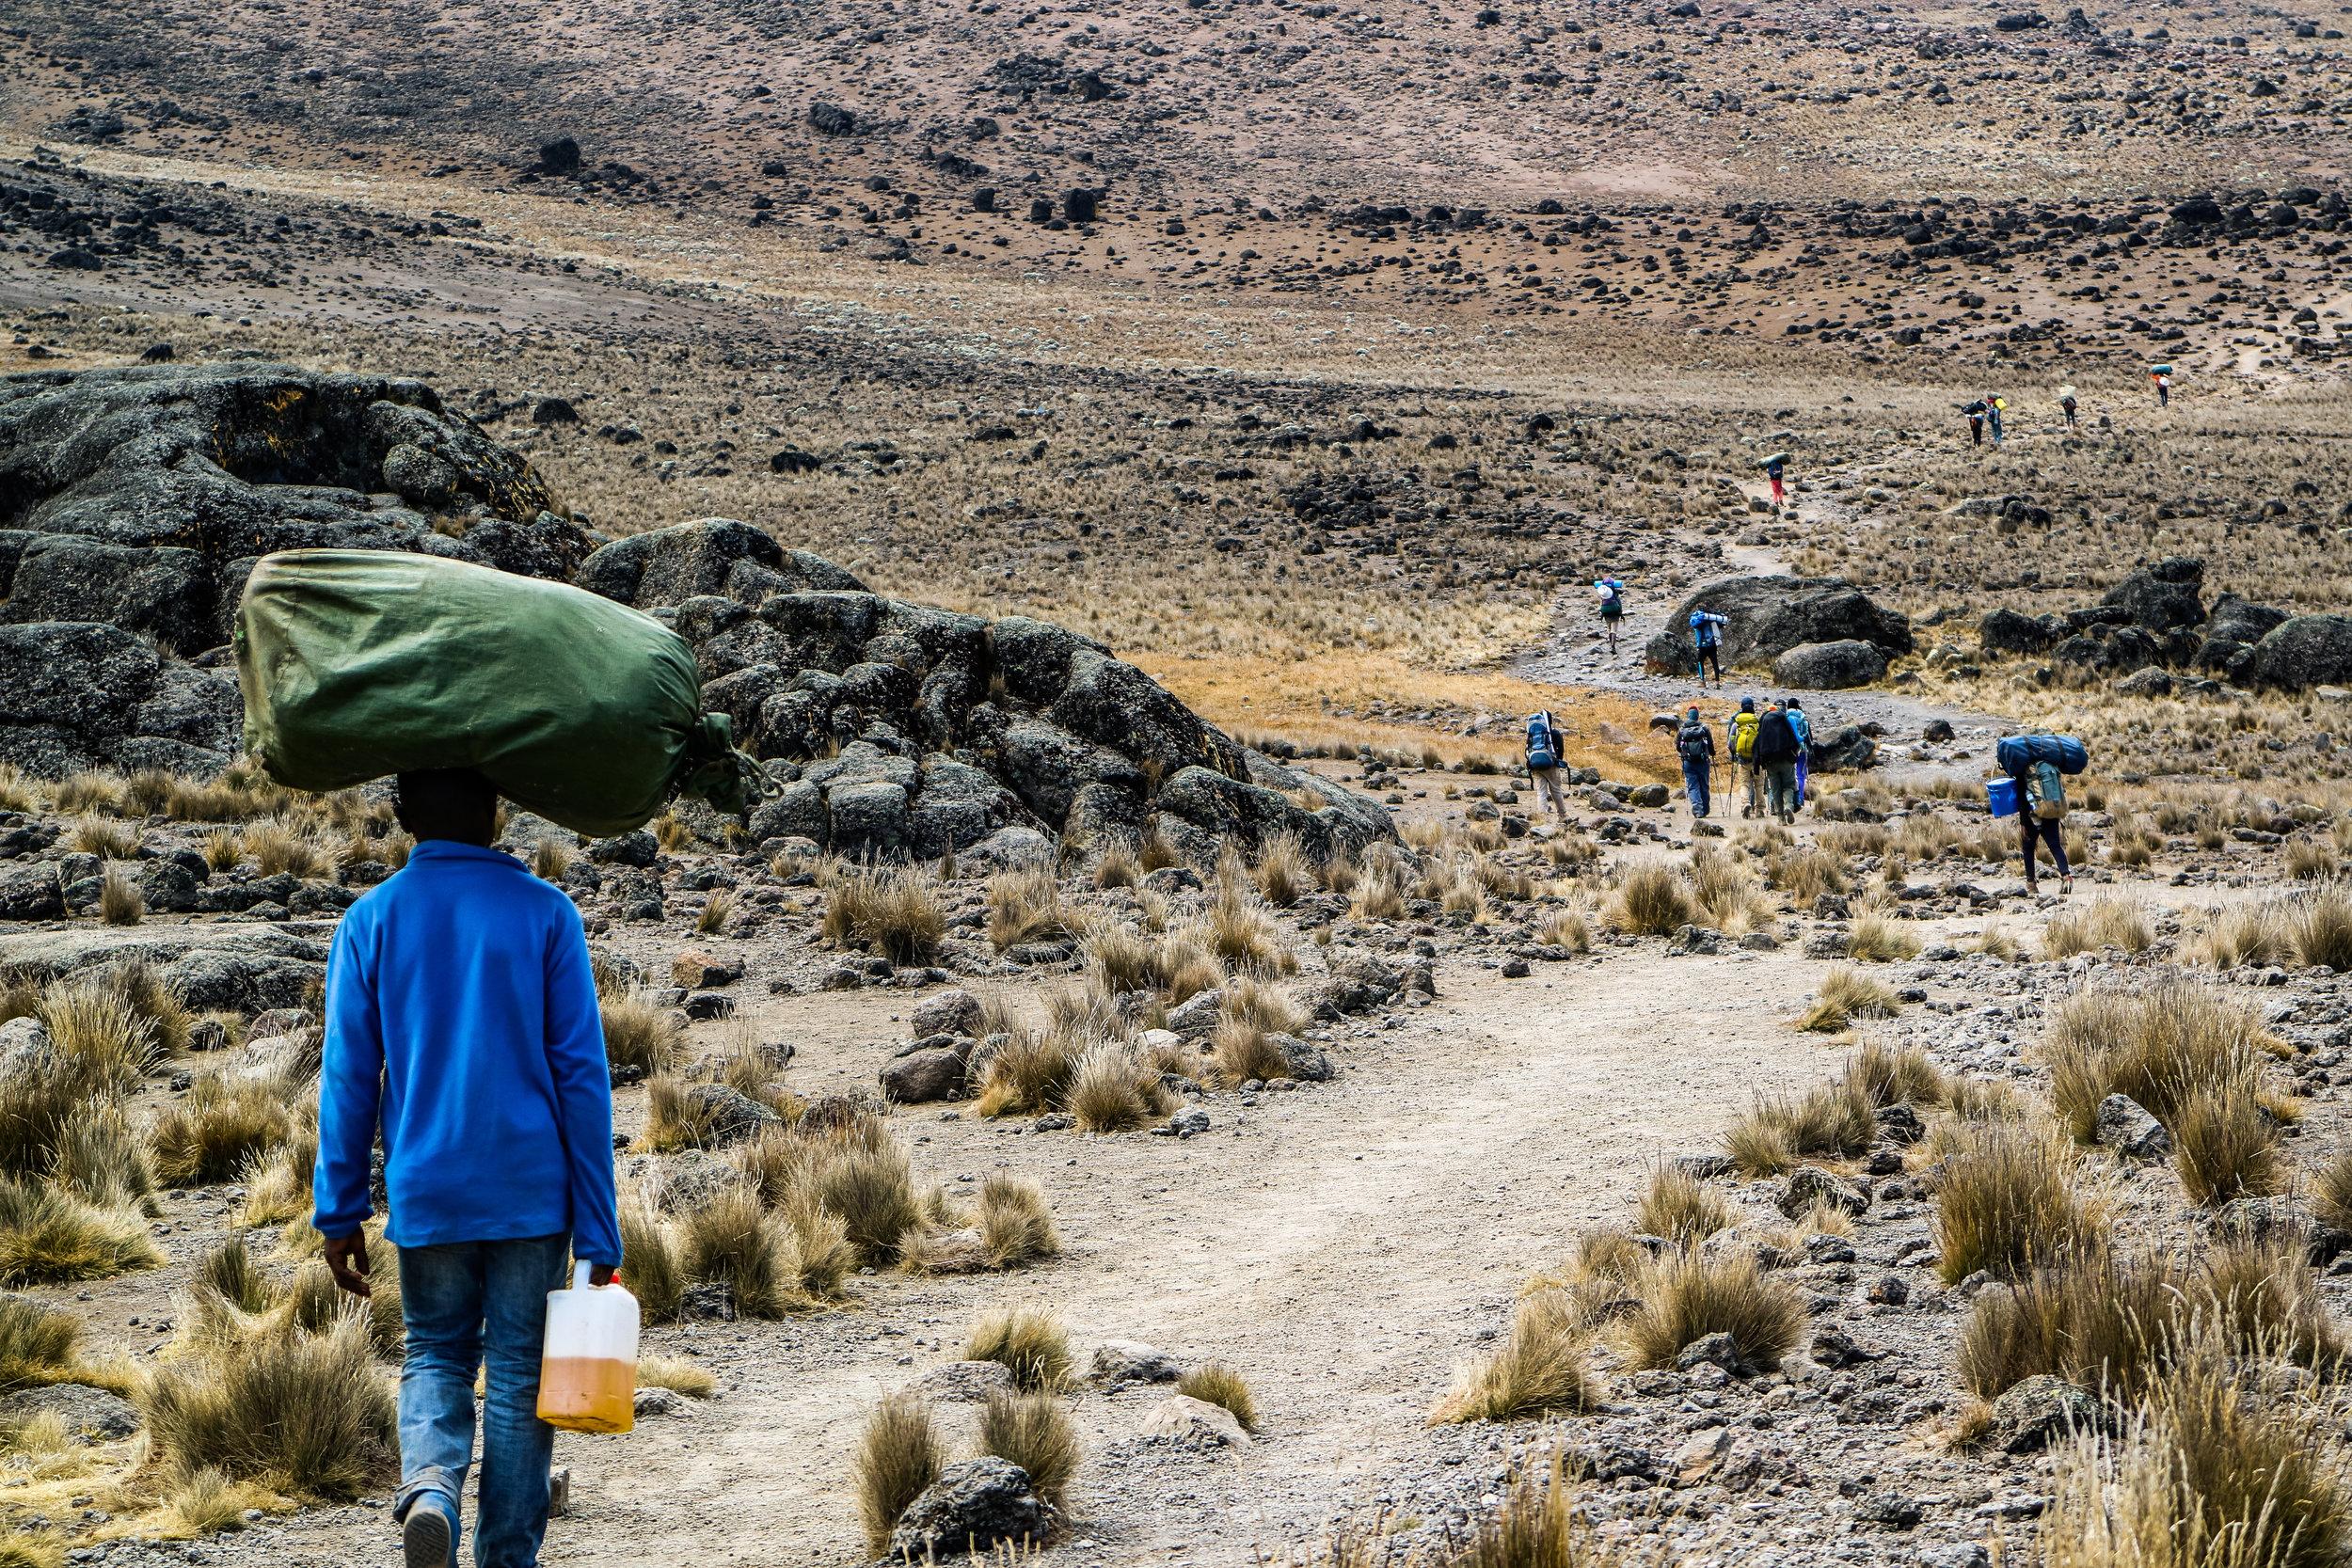 - Ethiopia Opens a Pandora's Box of Ethnic Tensions